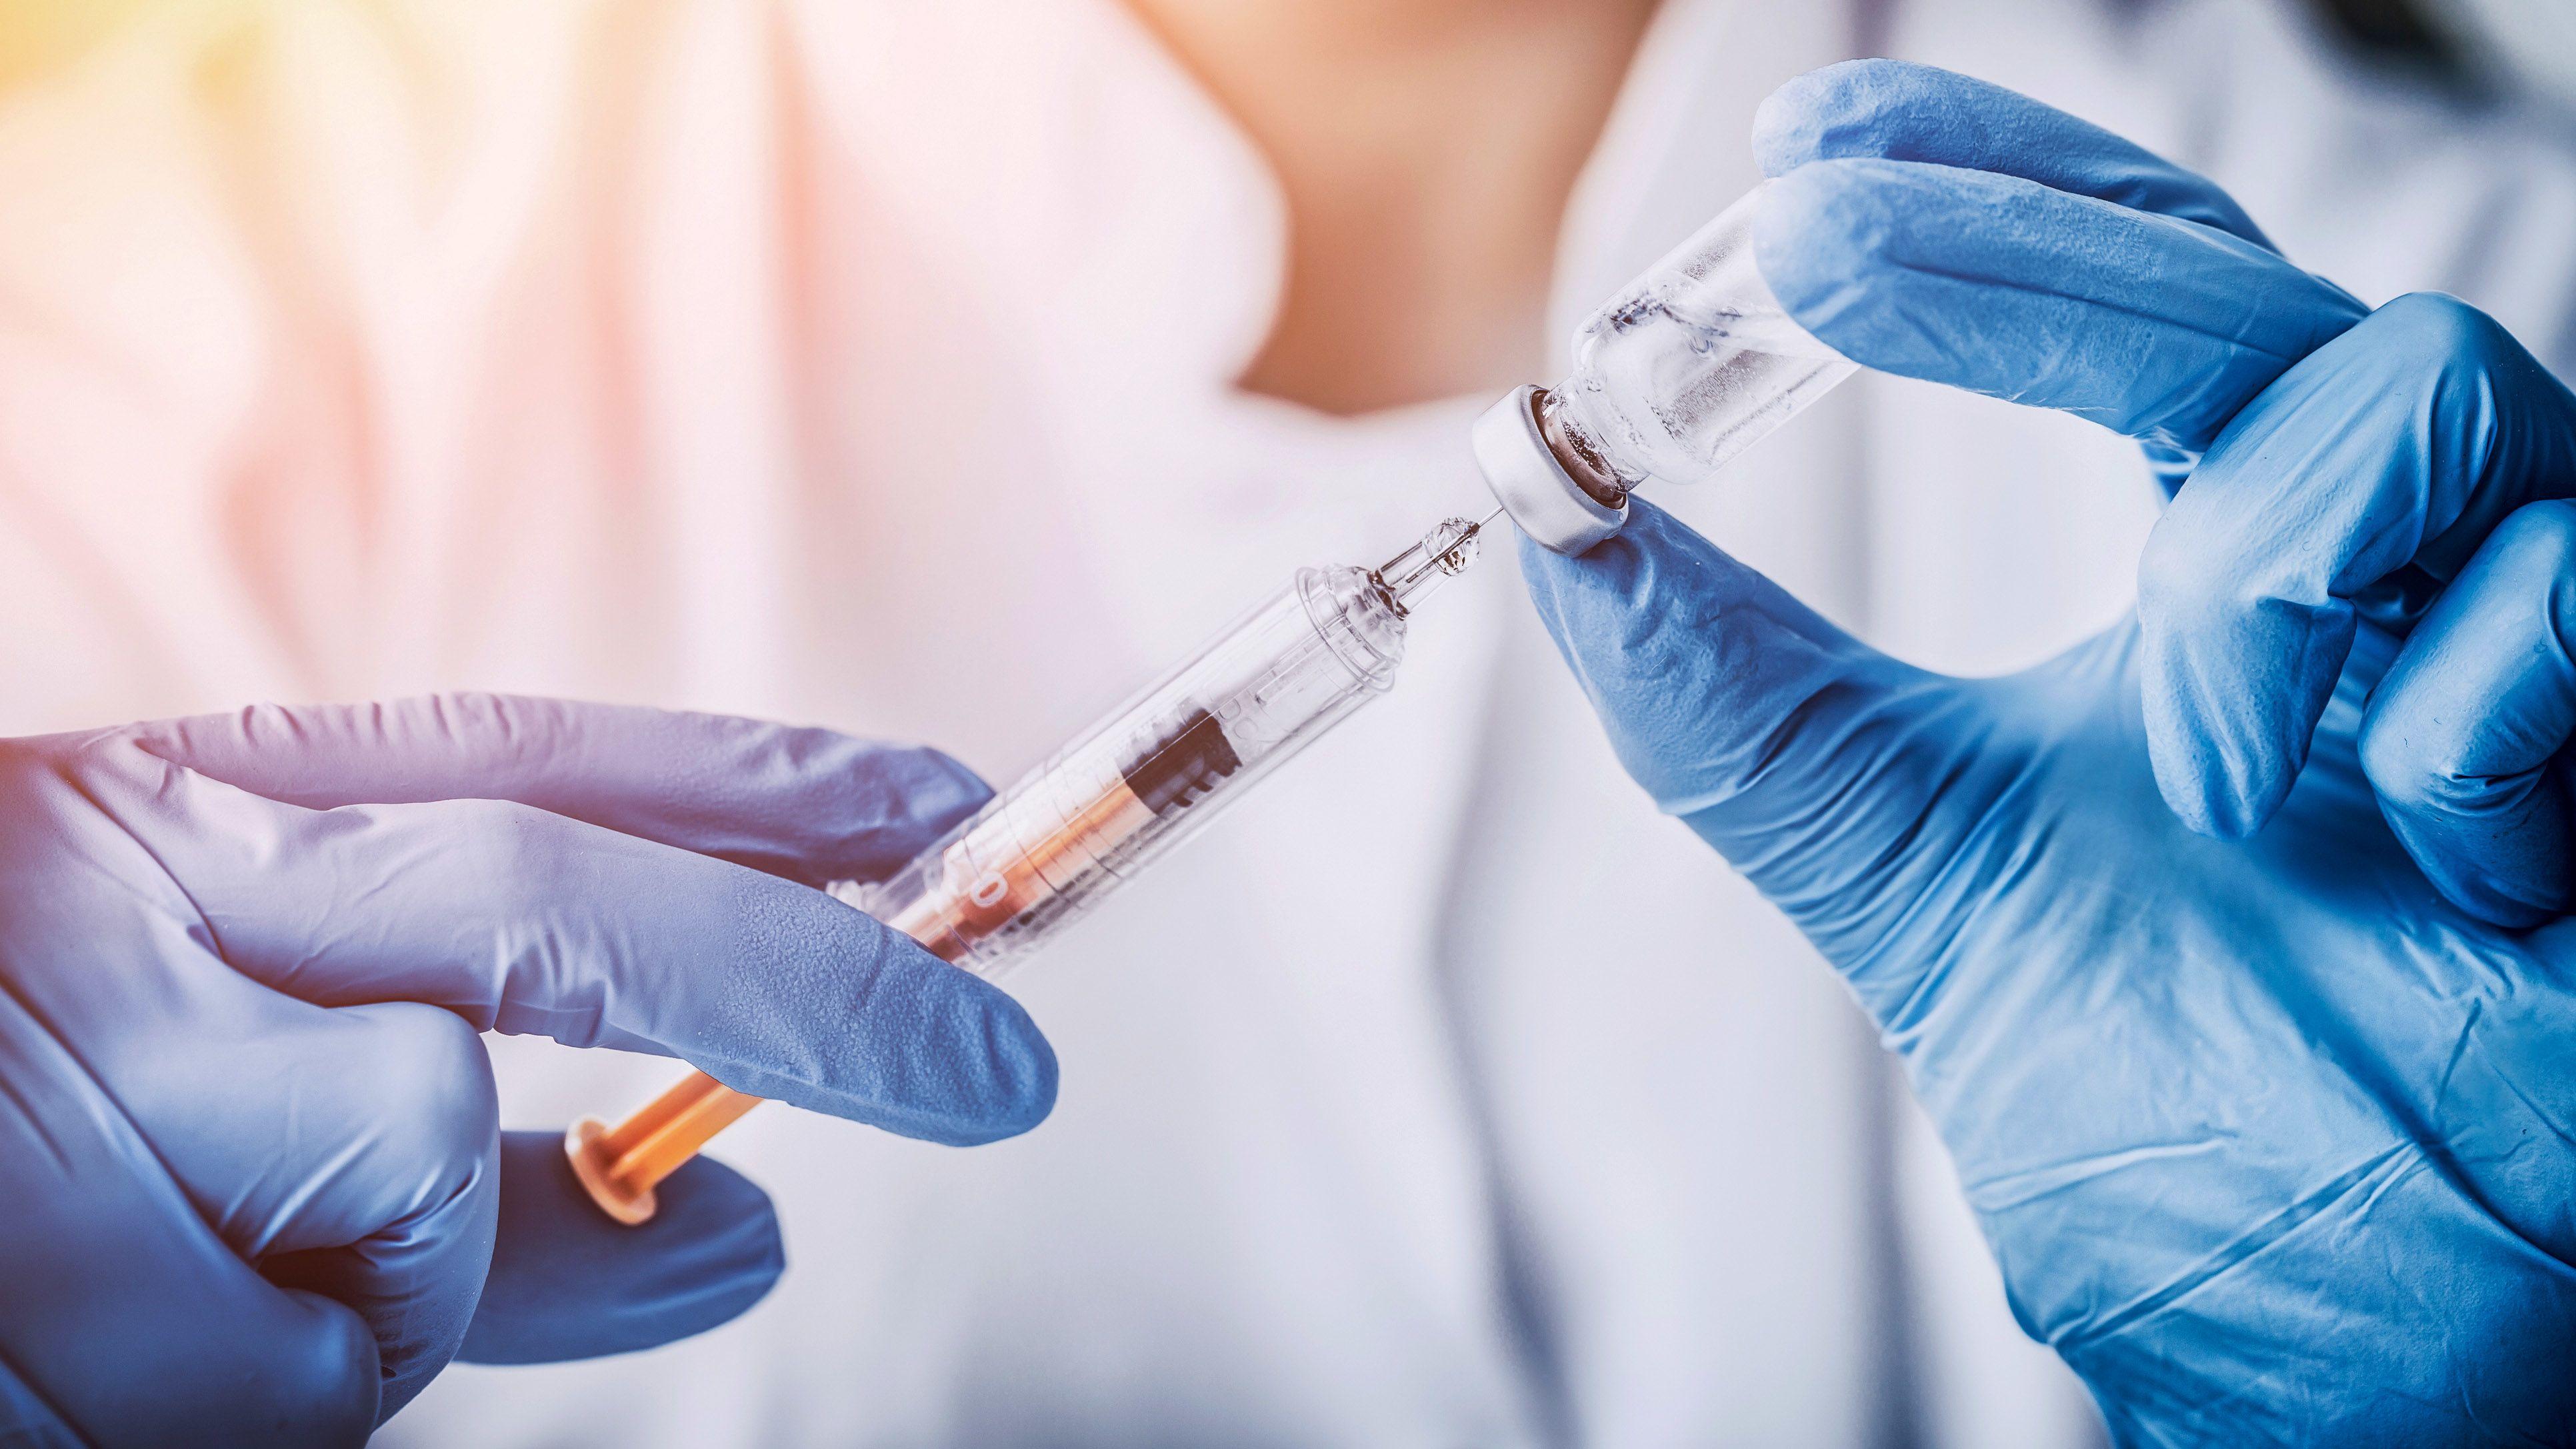 hpv vakcina rákban